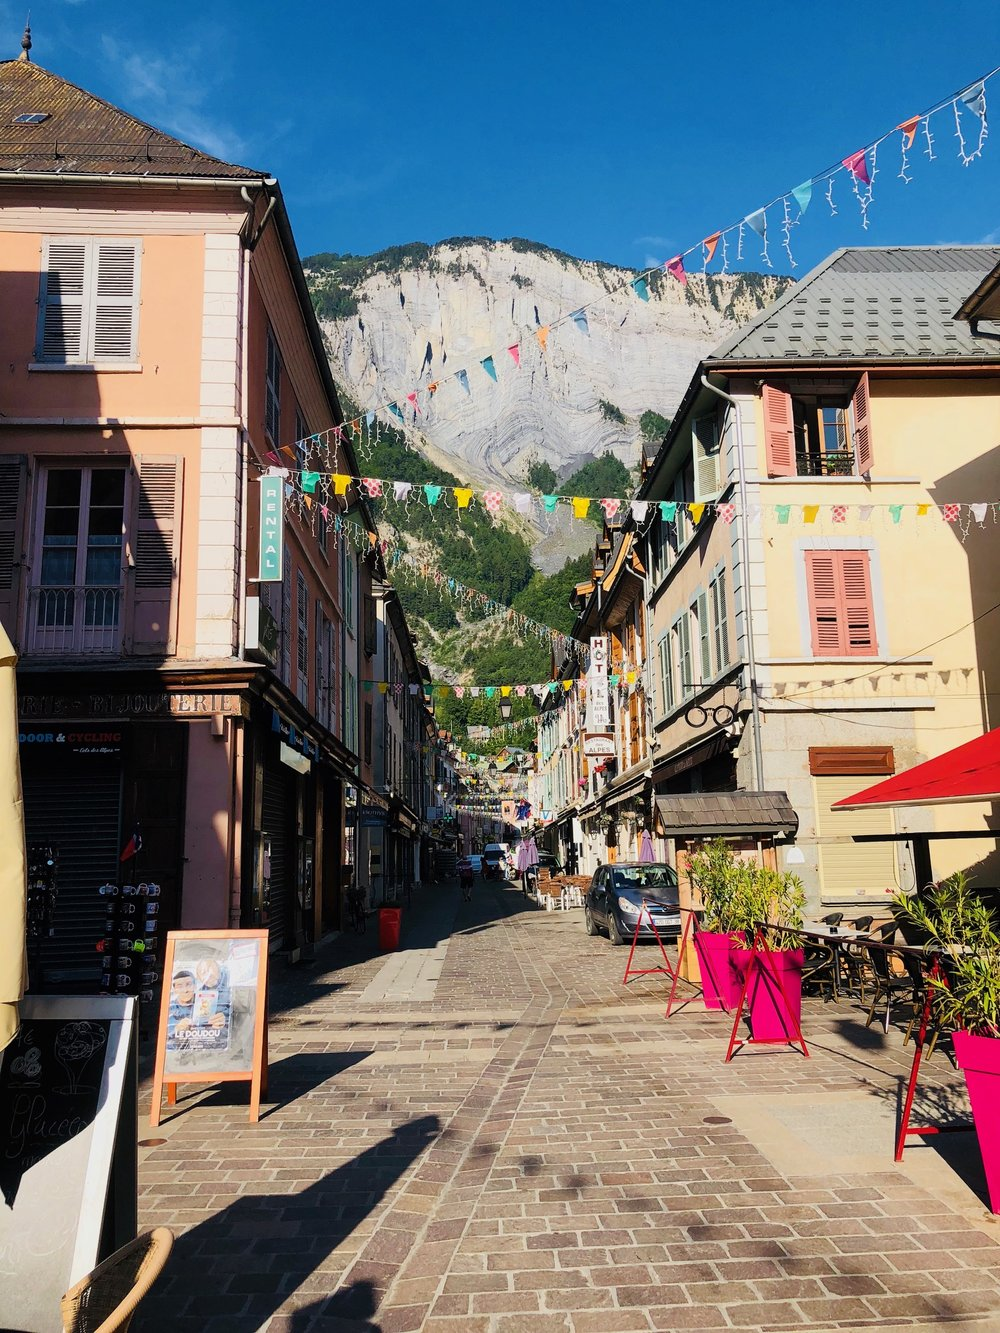 Le Bourg town photos.jpg